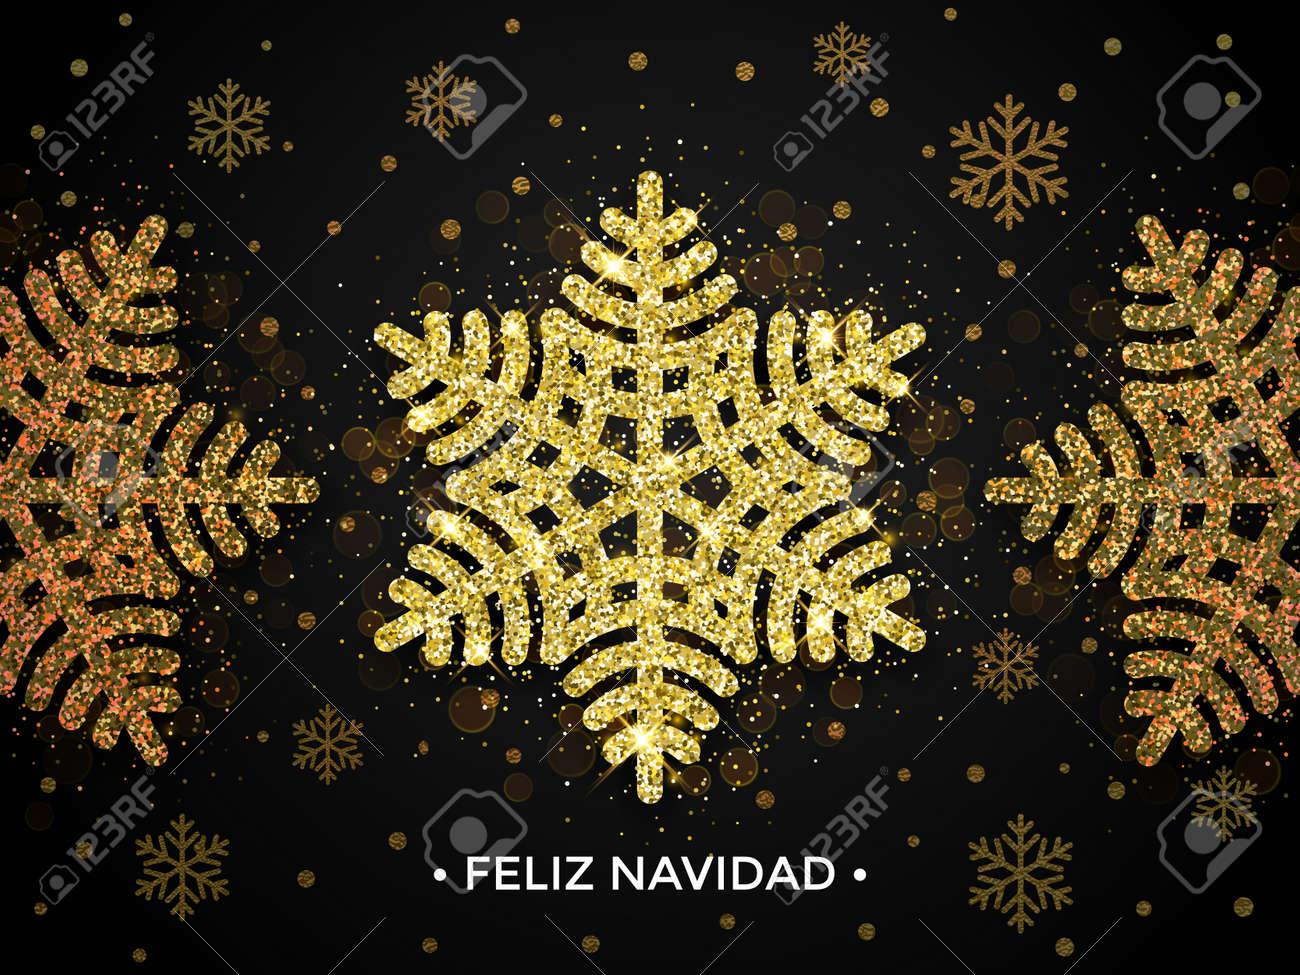 Feliz Navidad Greeting Card With Golden Snowflakes Merry Christmas